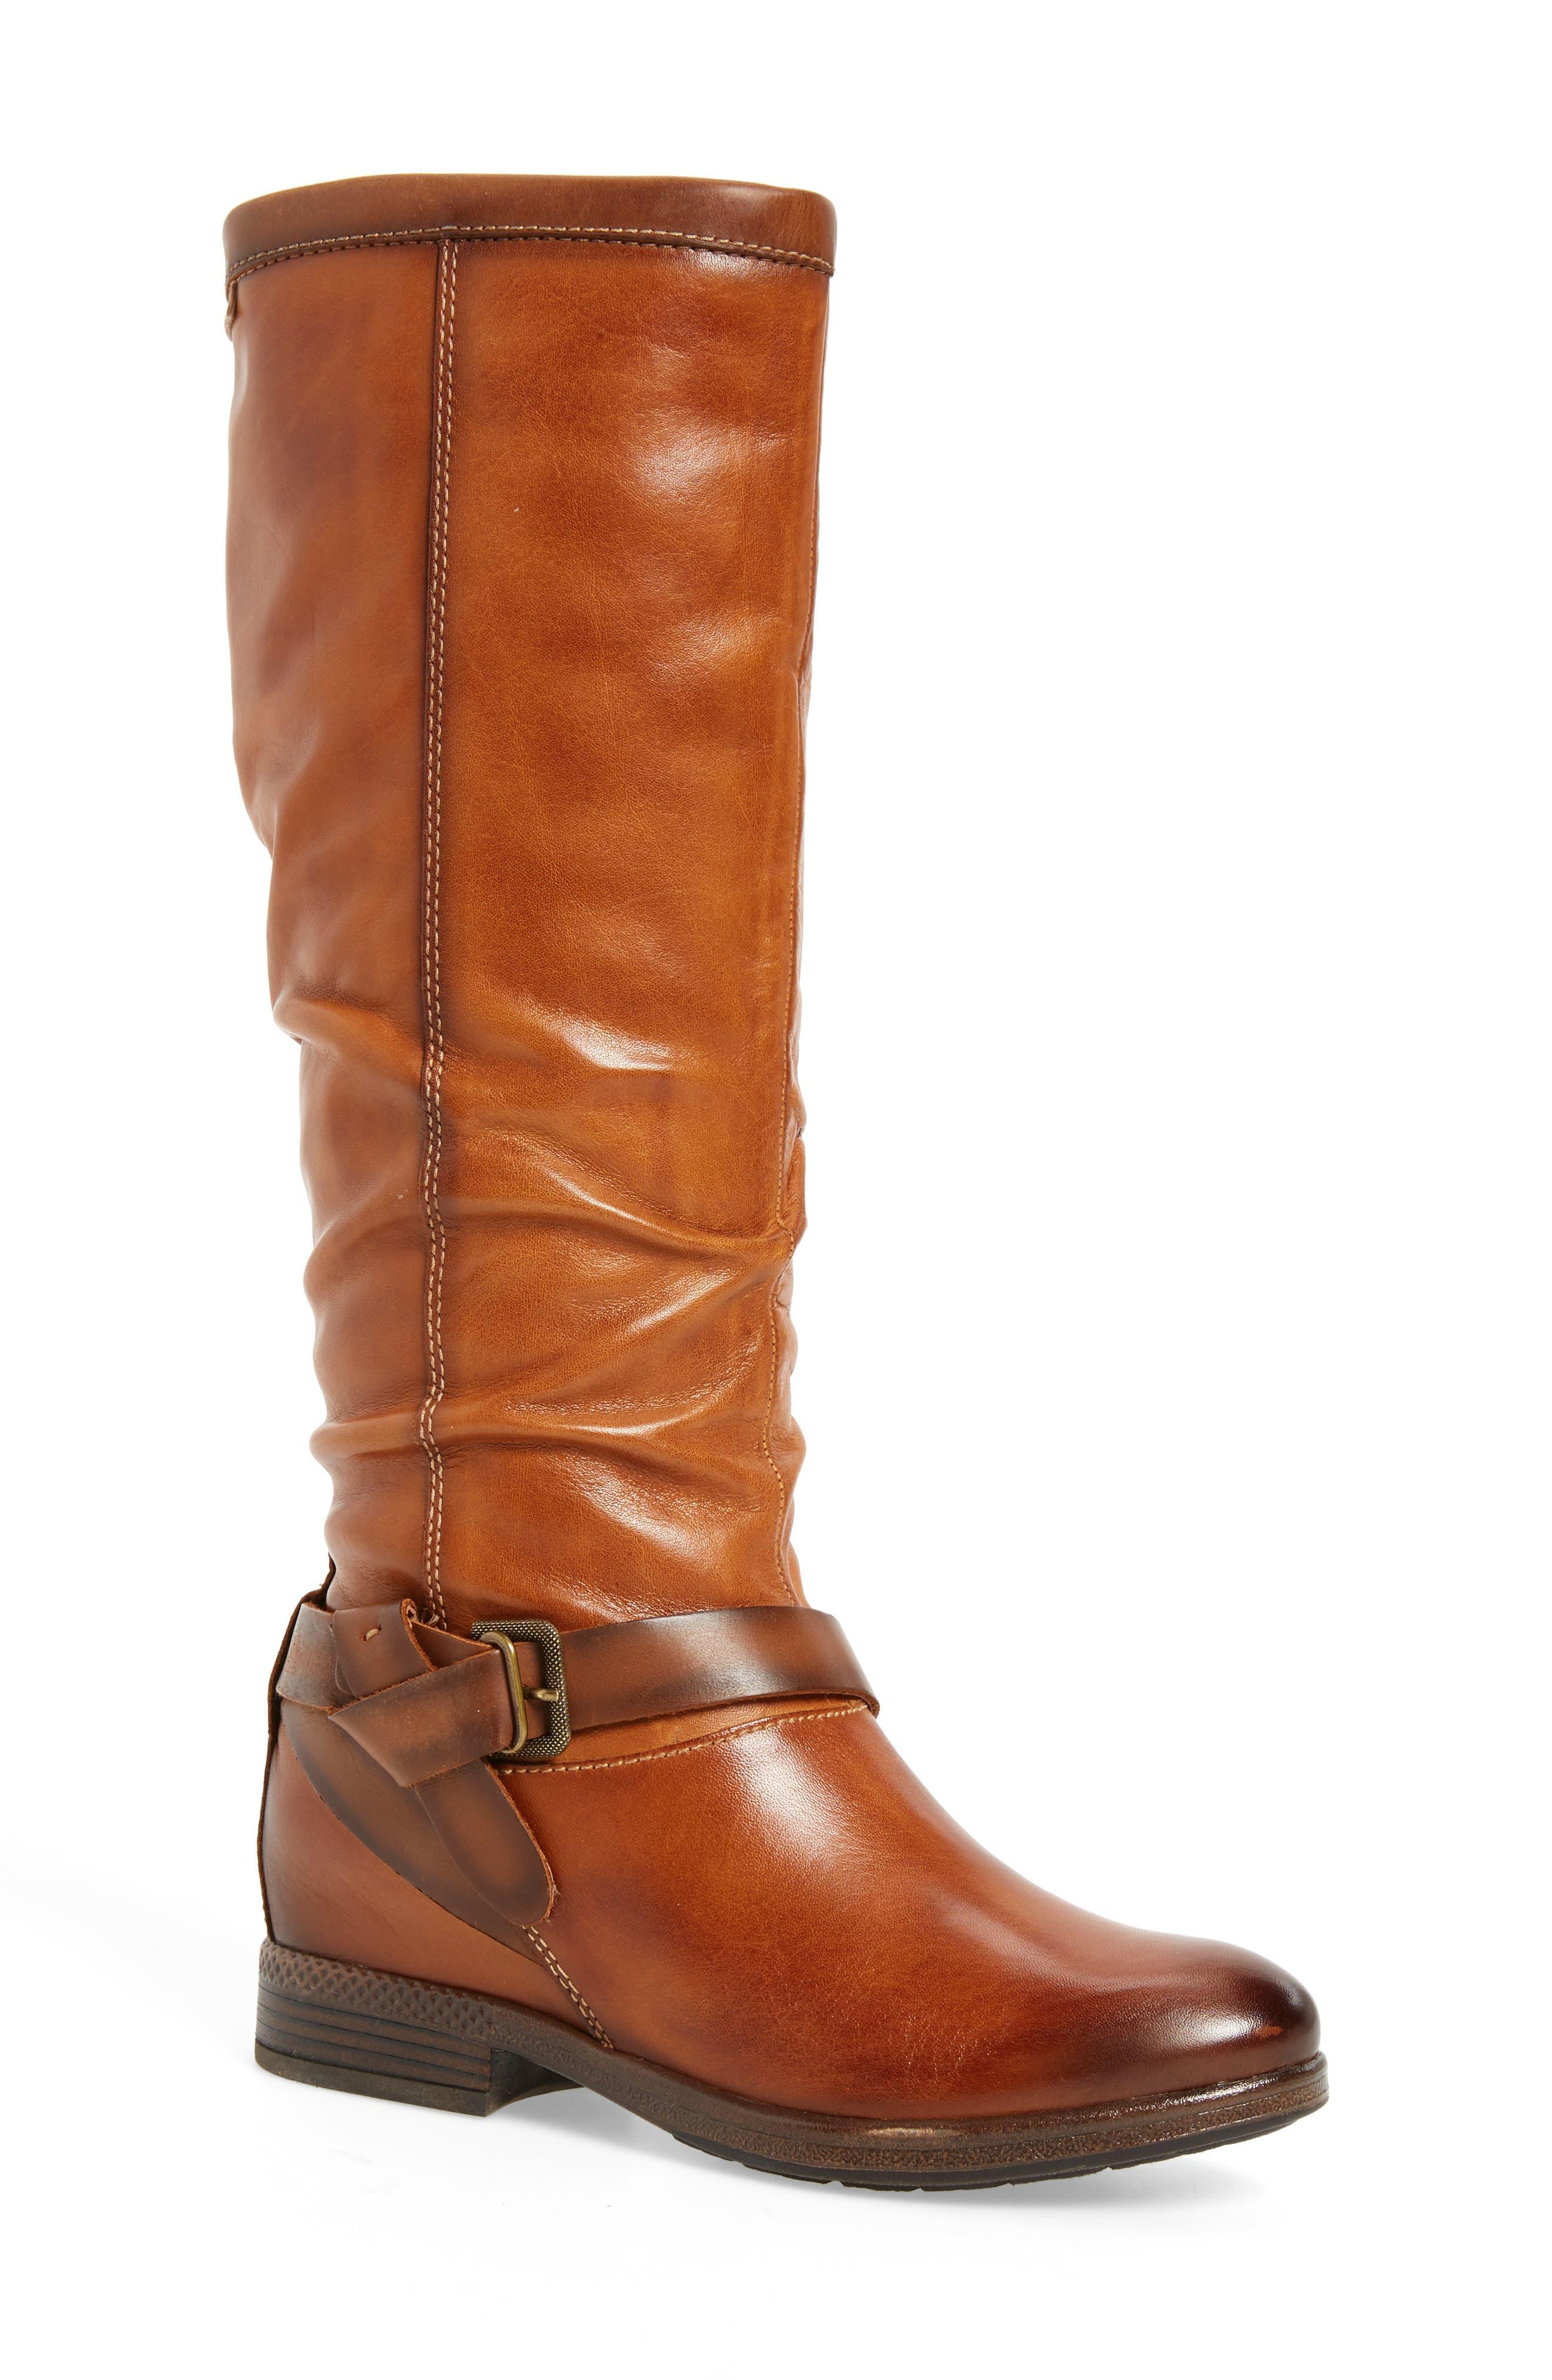 Ordino Knee High Boot,                             Main thumbnail 1, color,                             Brandy Cuero Leather